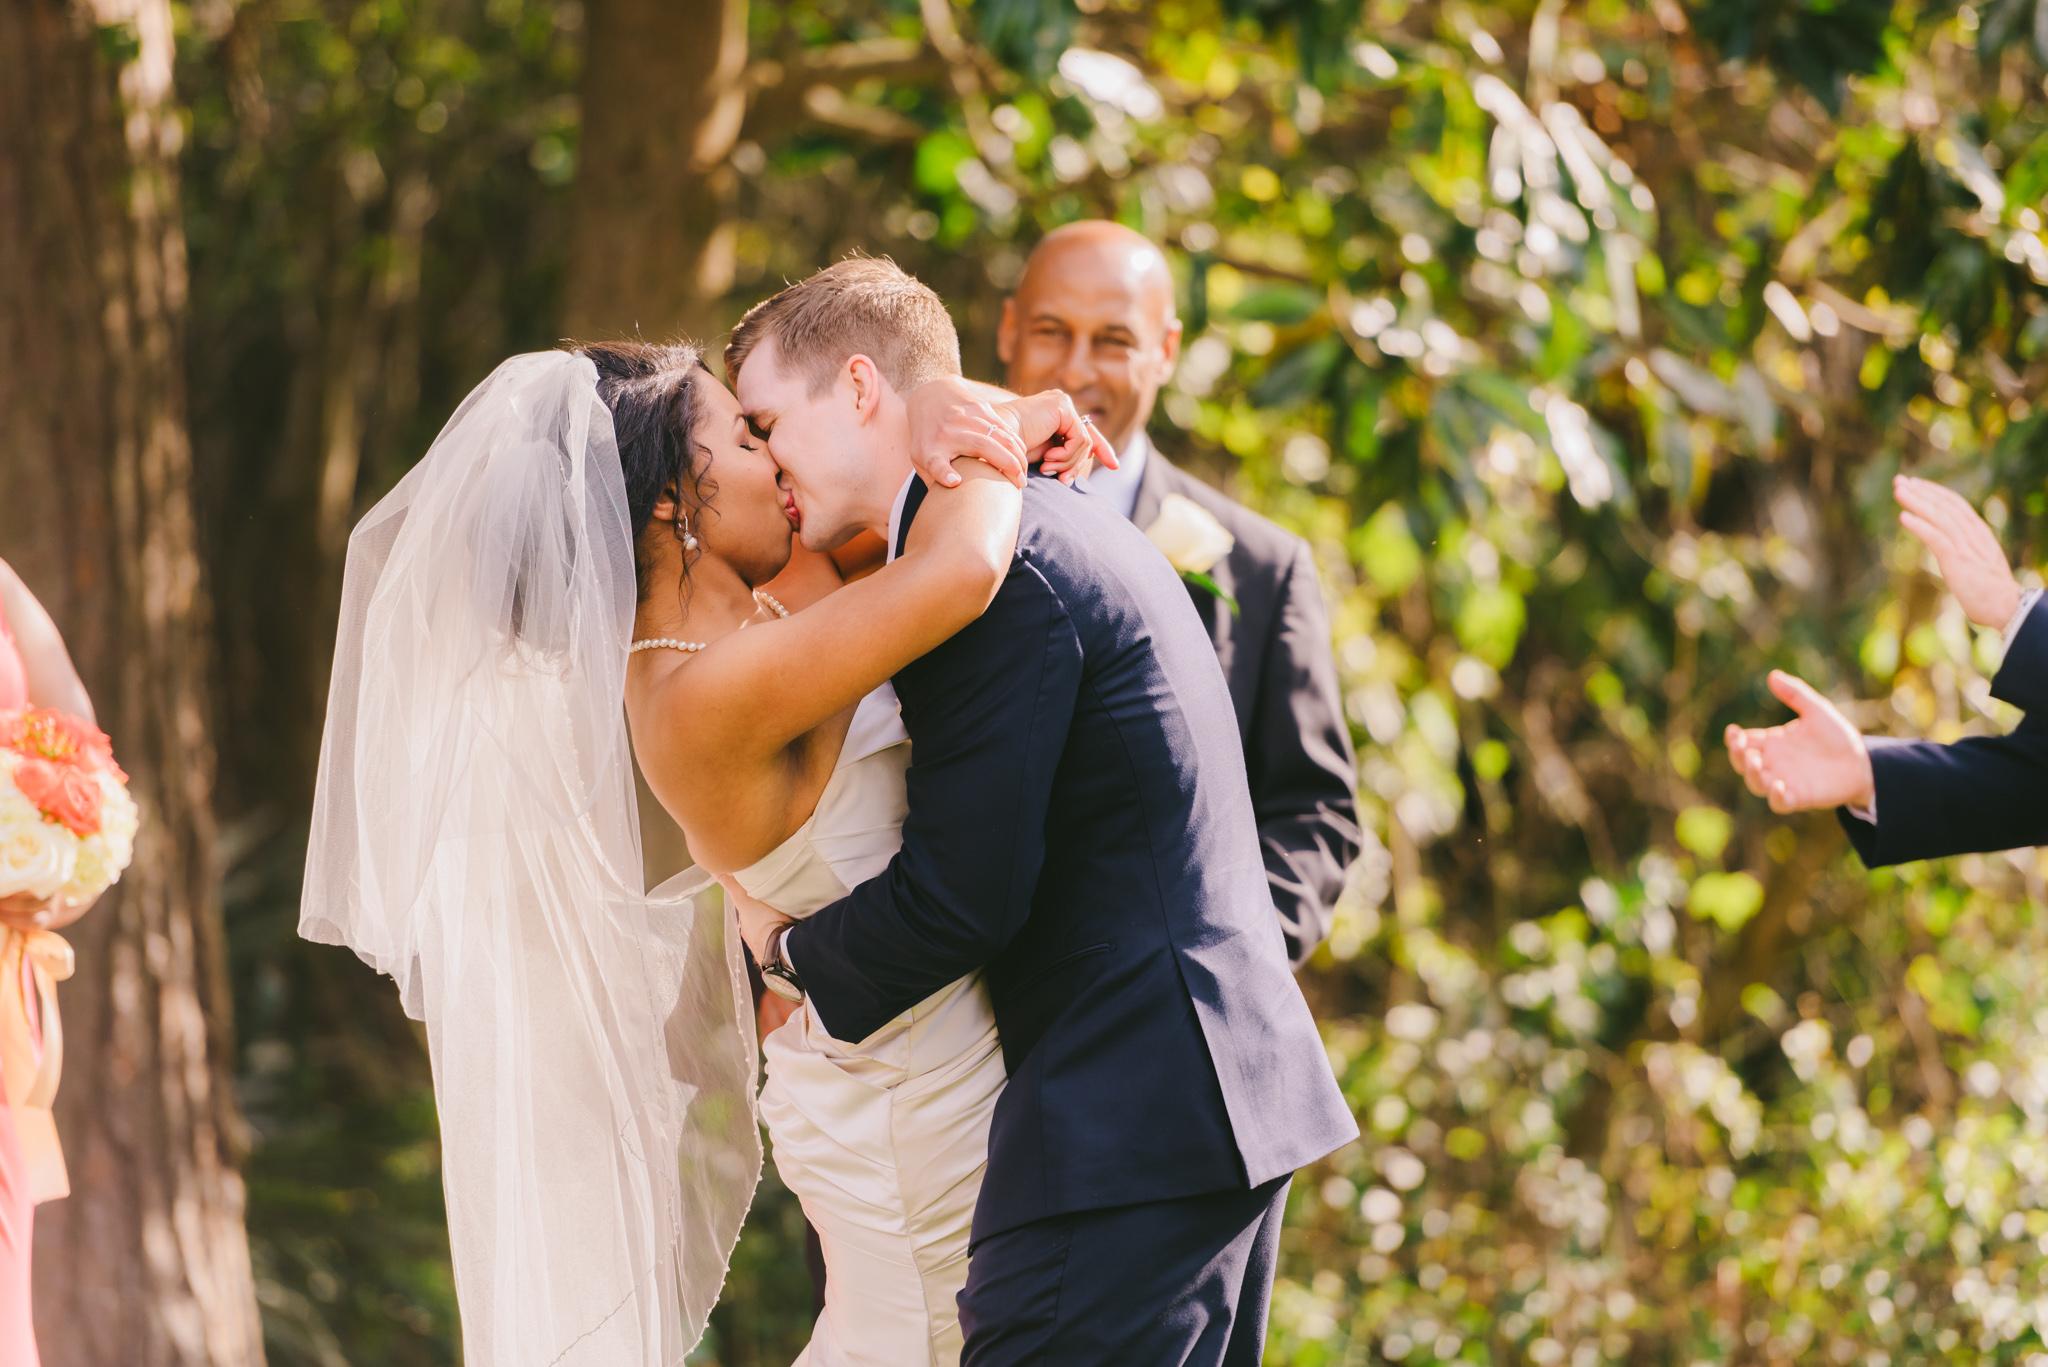 Hozik_Wedding-442.jpg